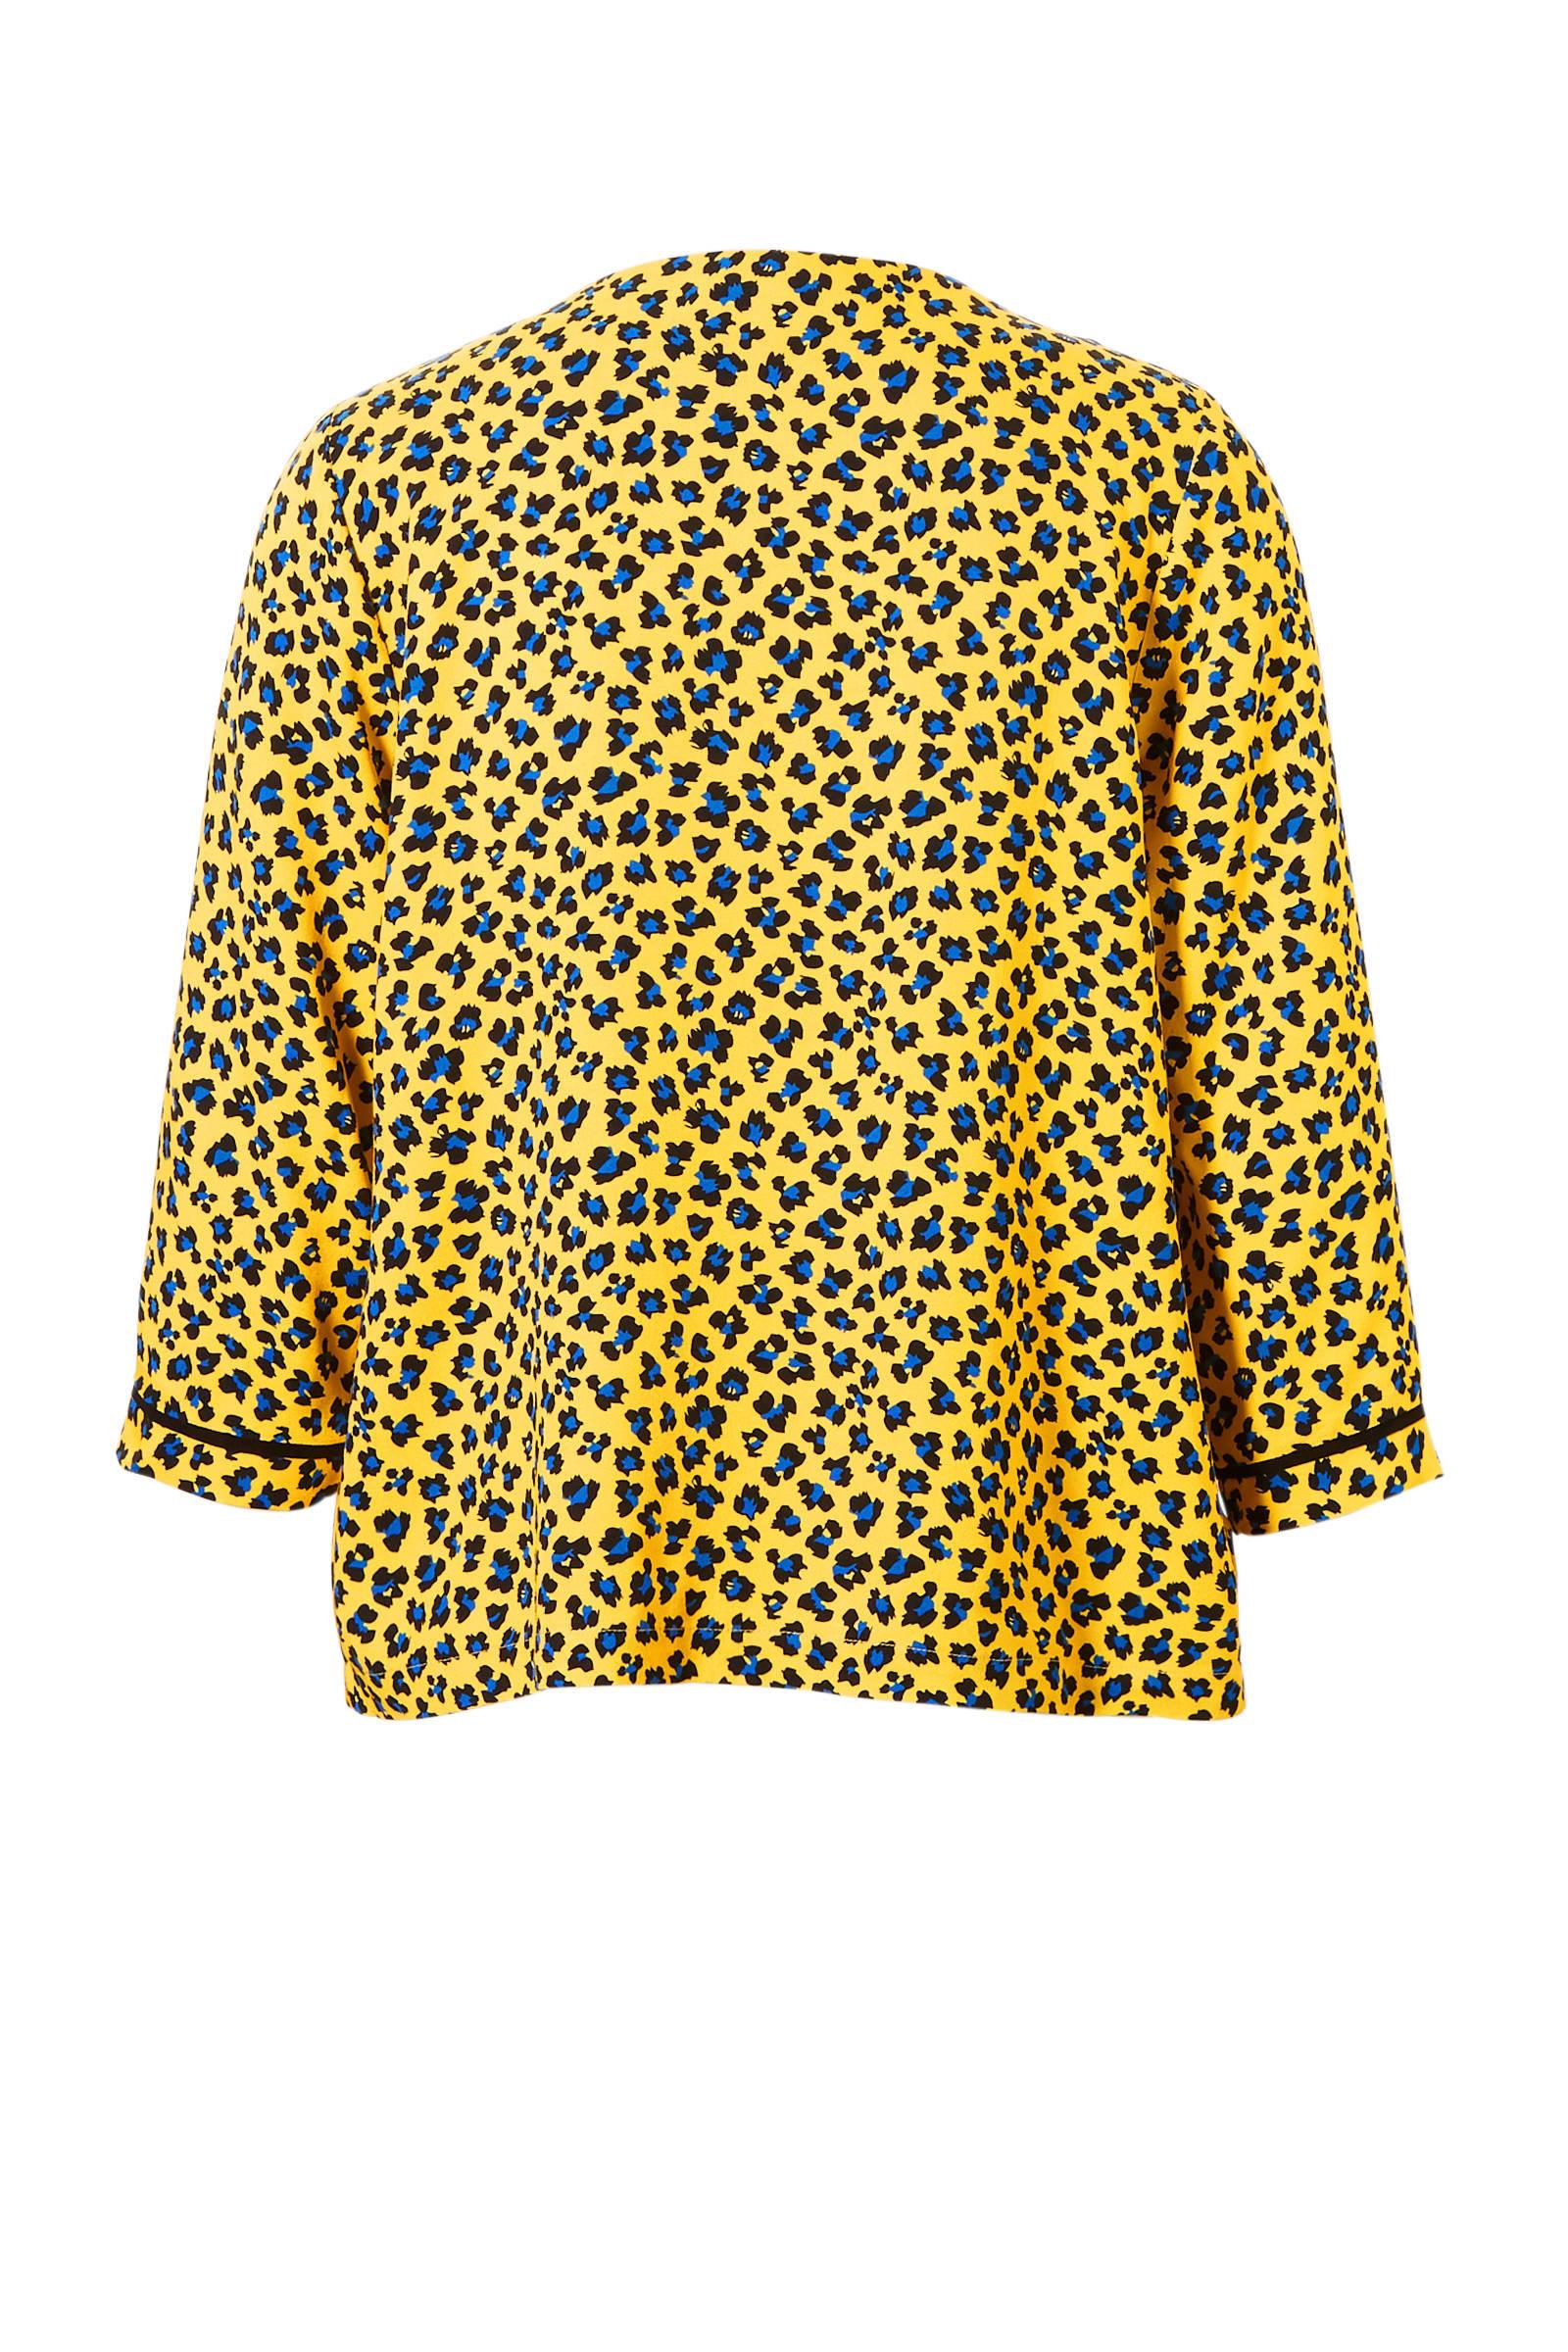 met panterprint met Aaiko Aaiko blouse blouse 7wqvzd7F